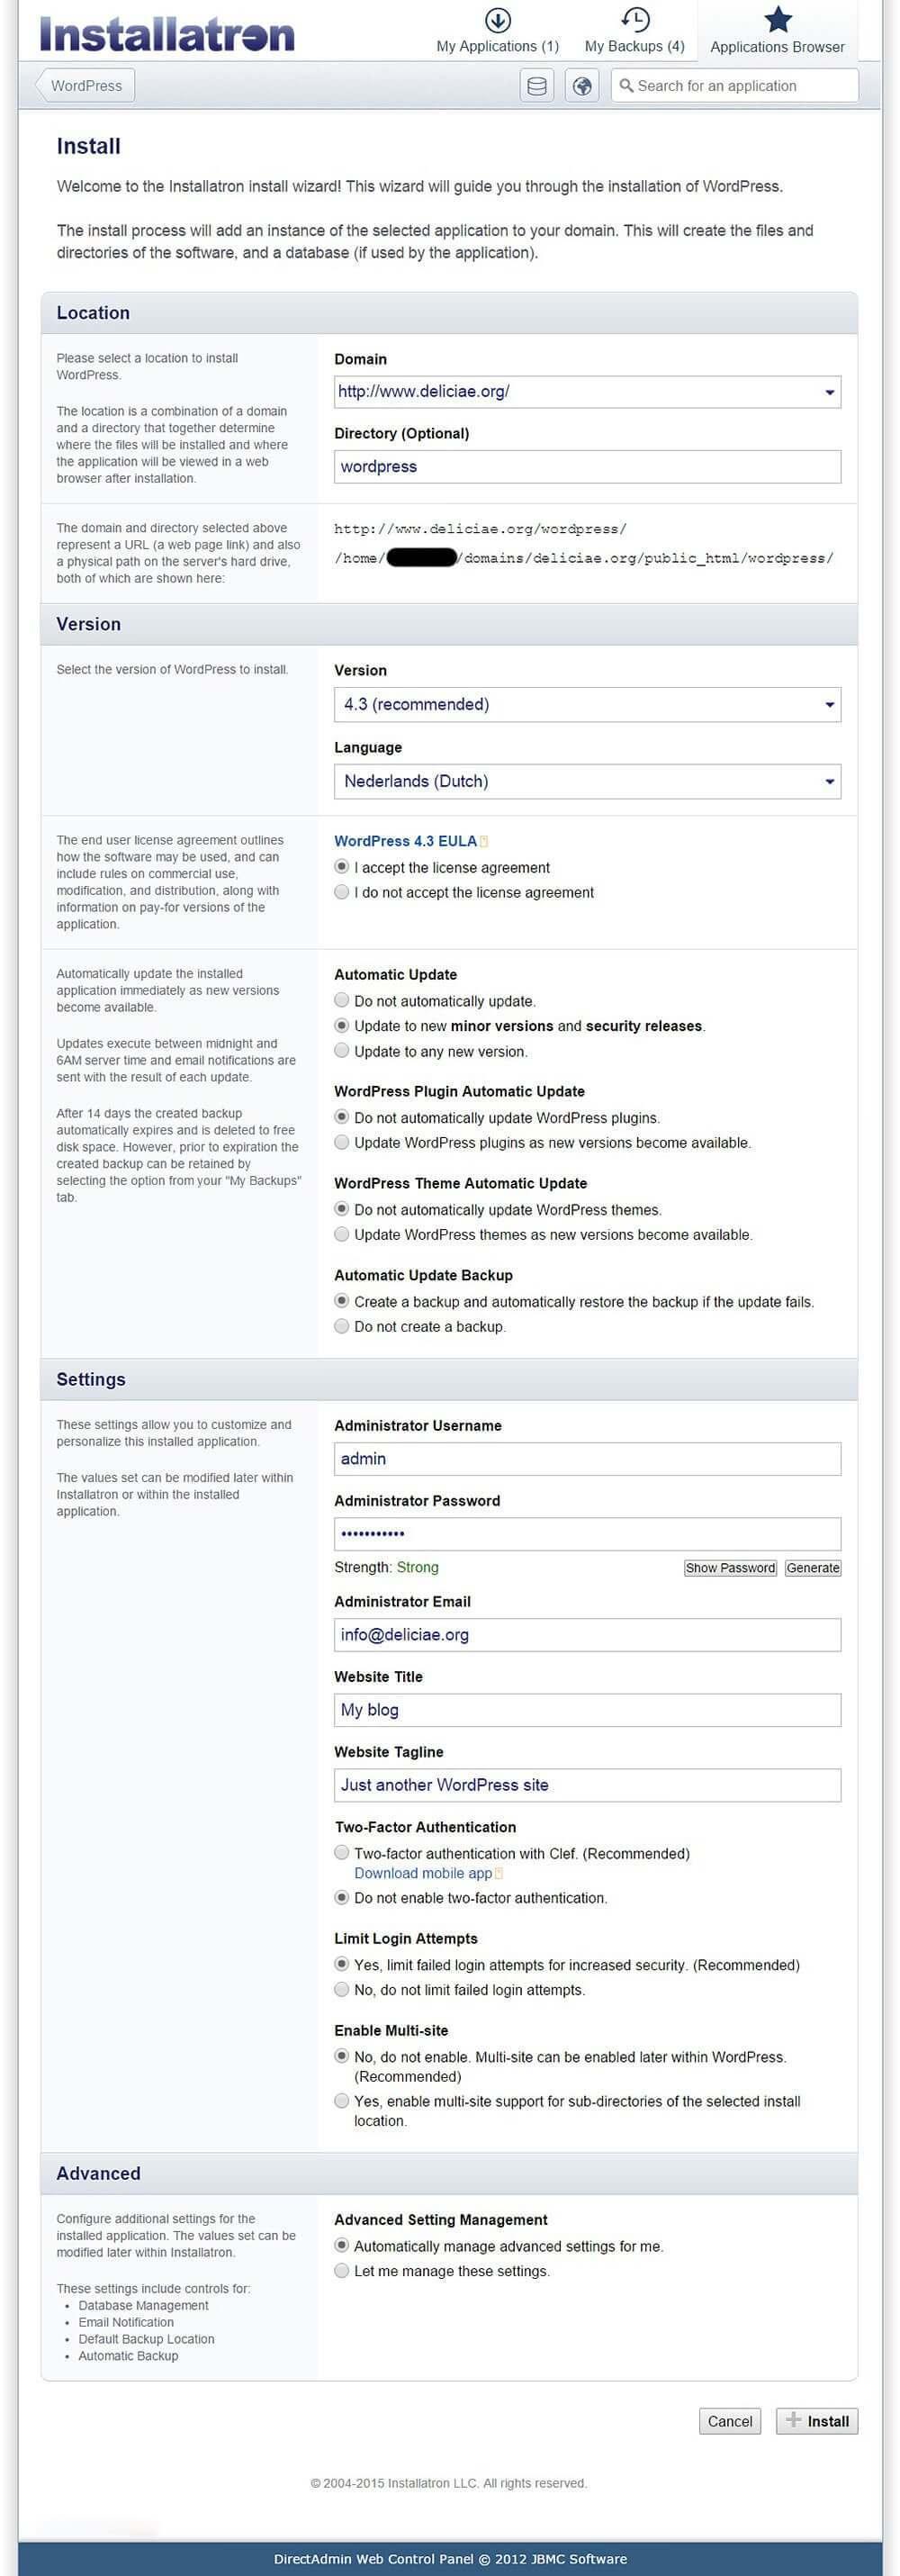 installatron-wordpress-install-steps